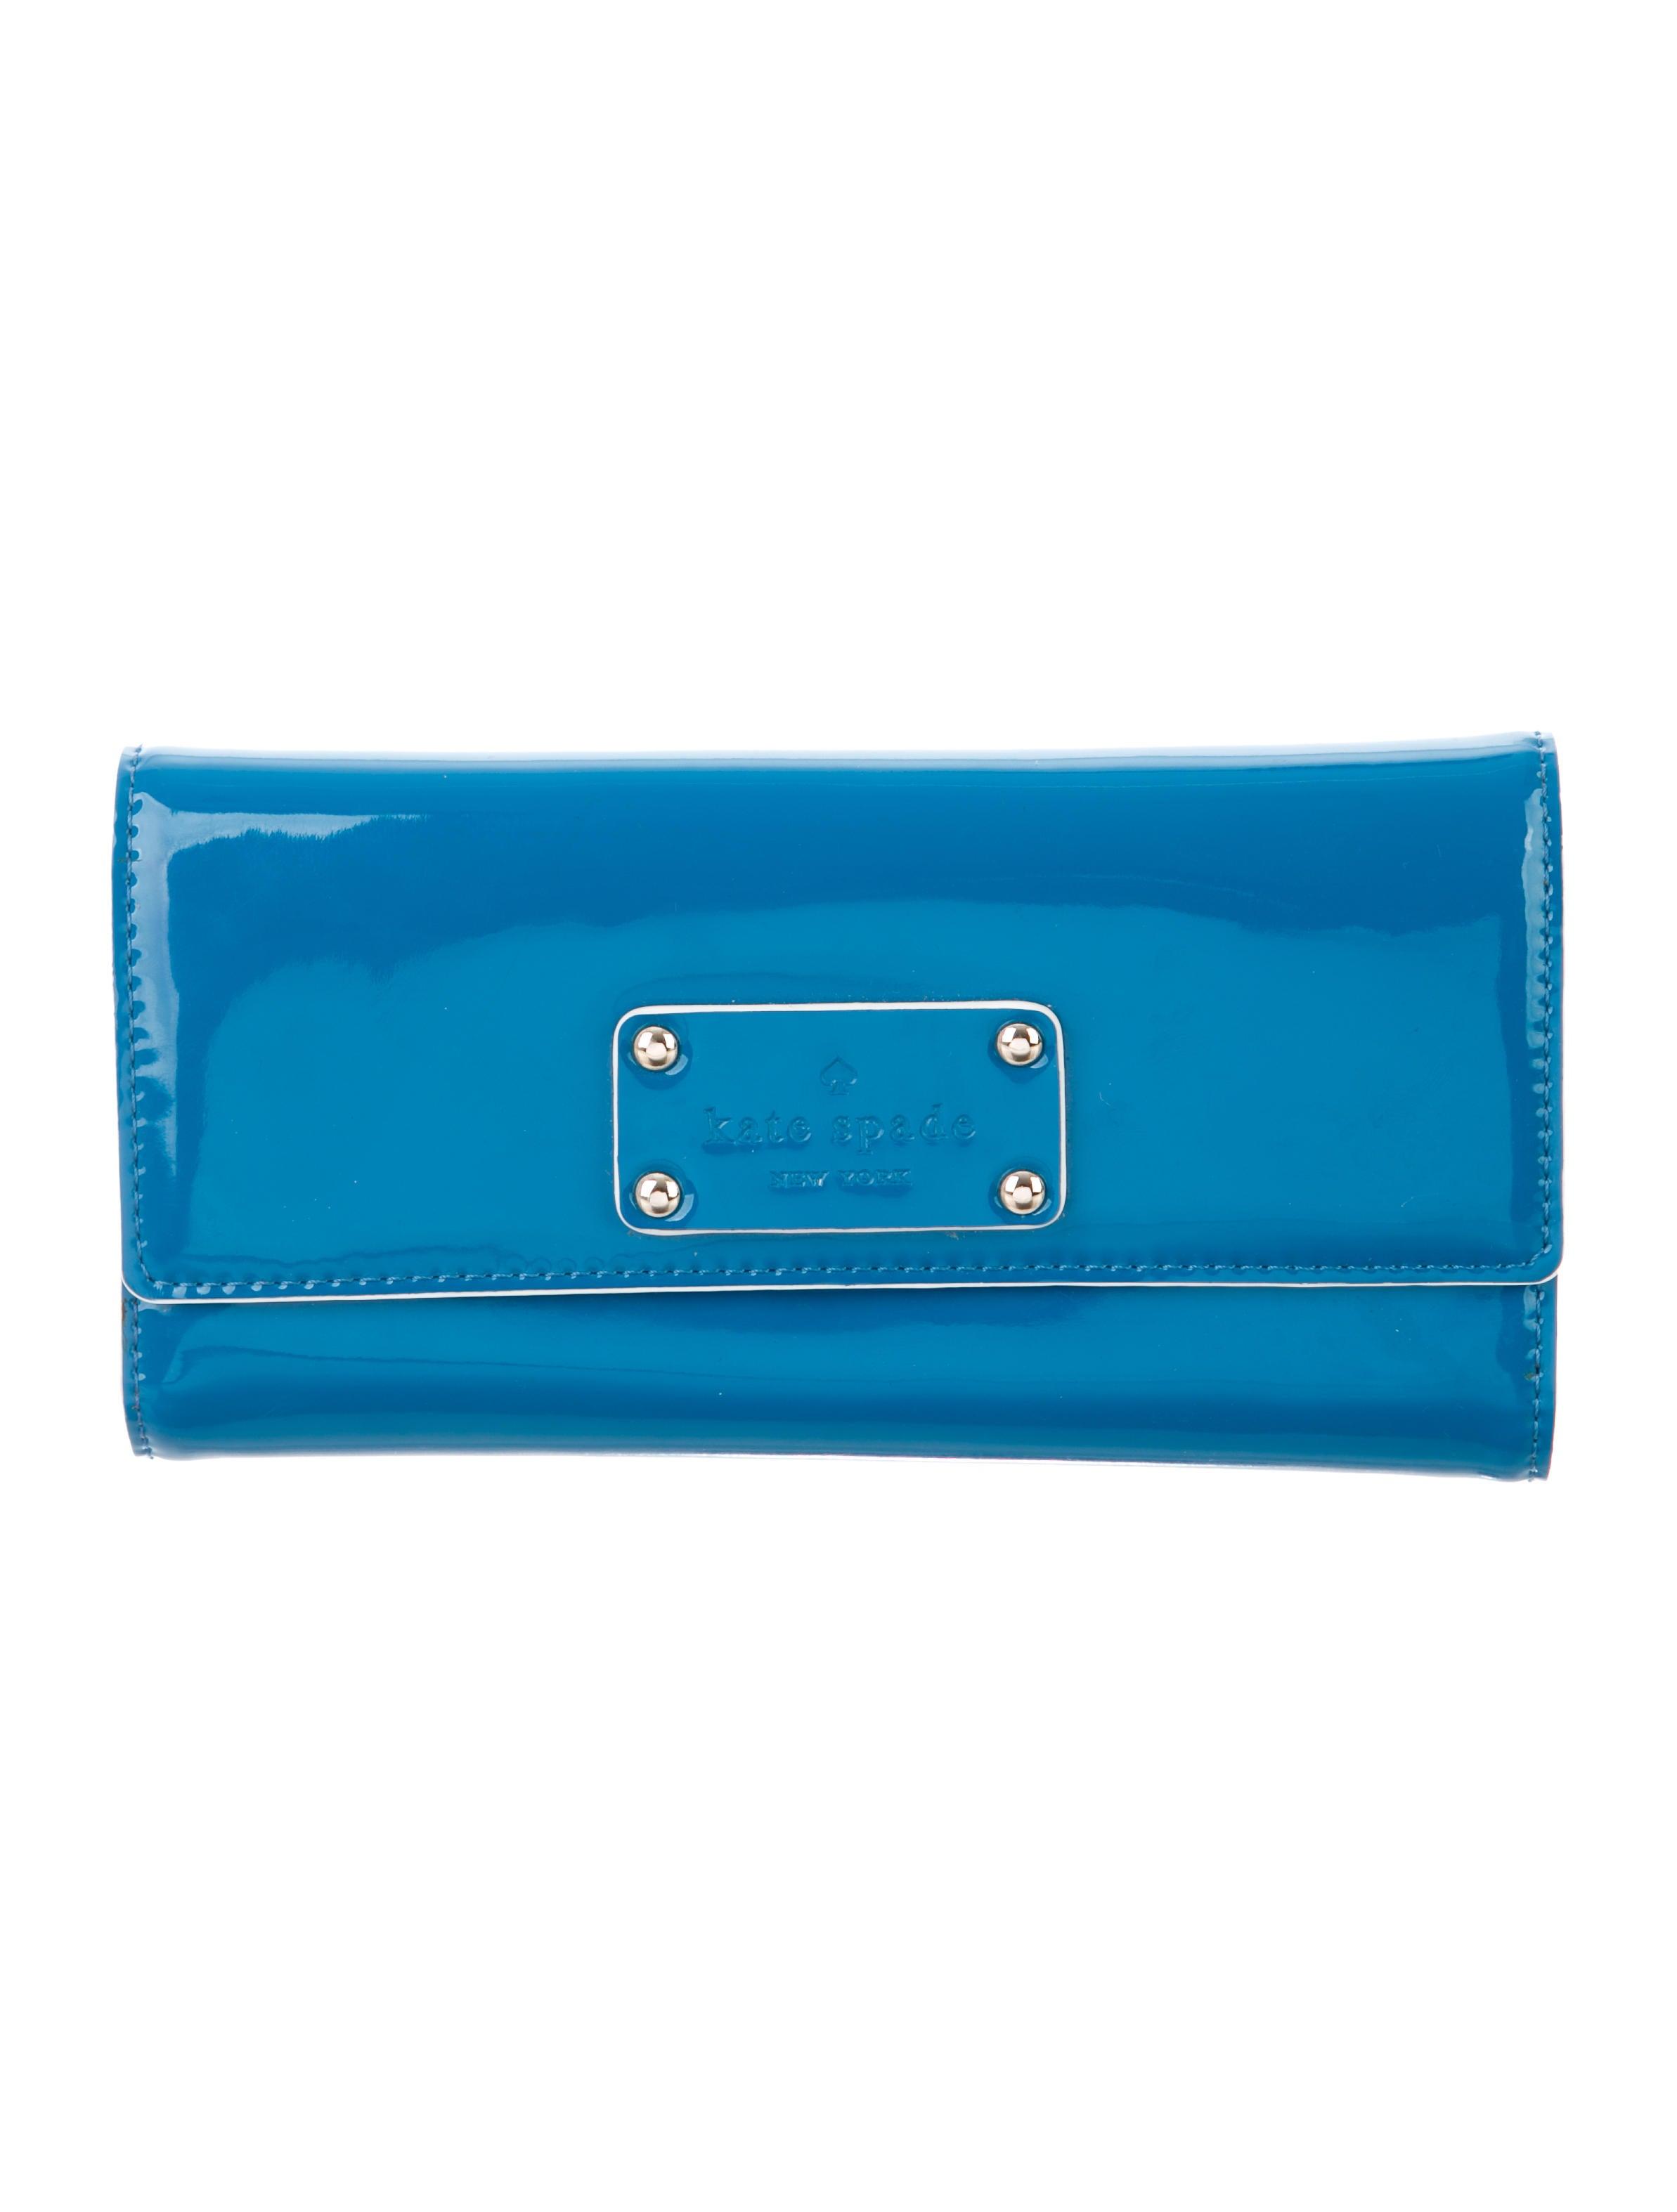 Aqua Kate Spade Pasadena New Sander Wallet